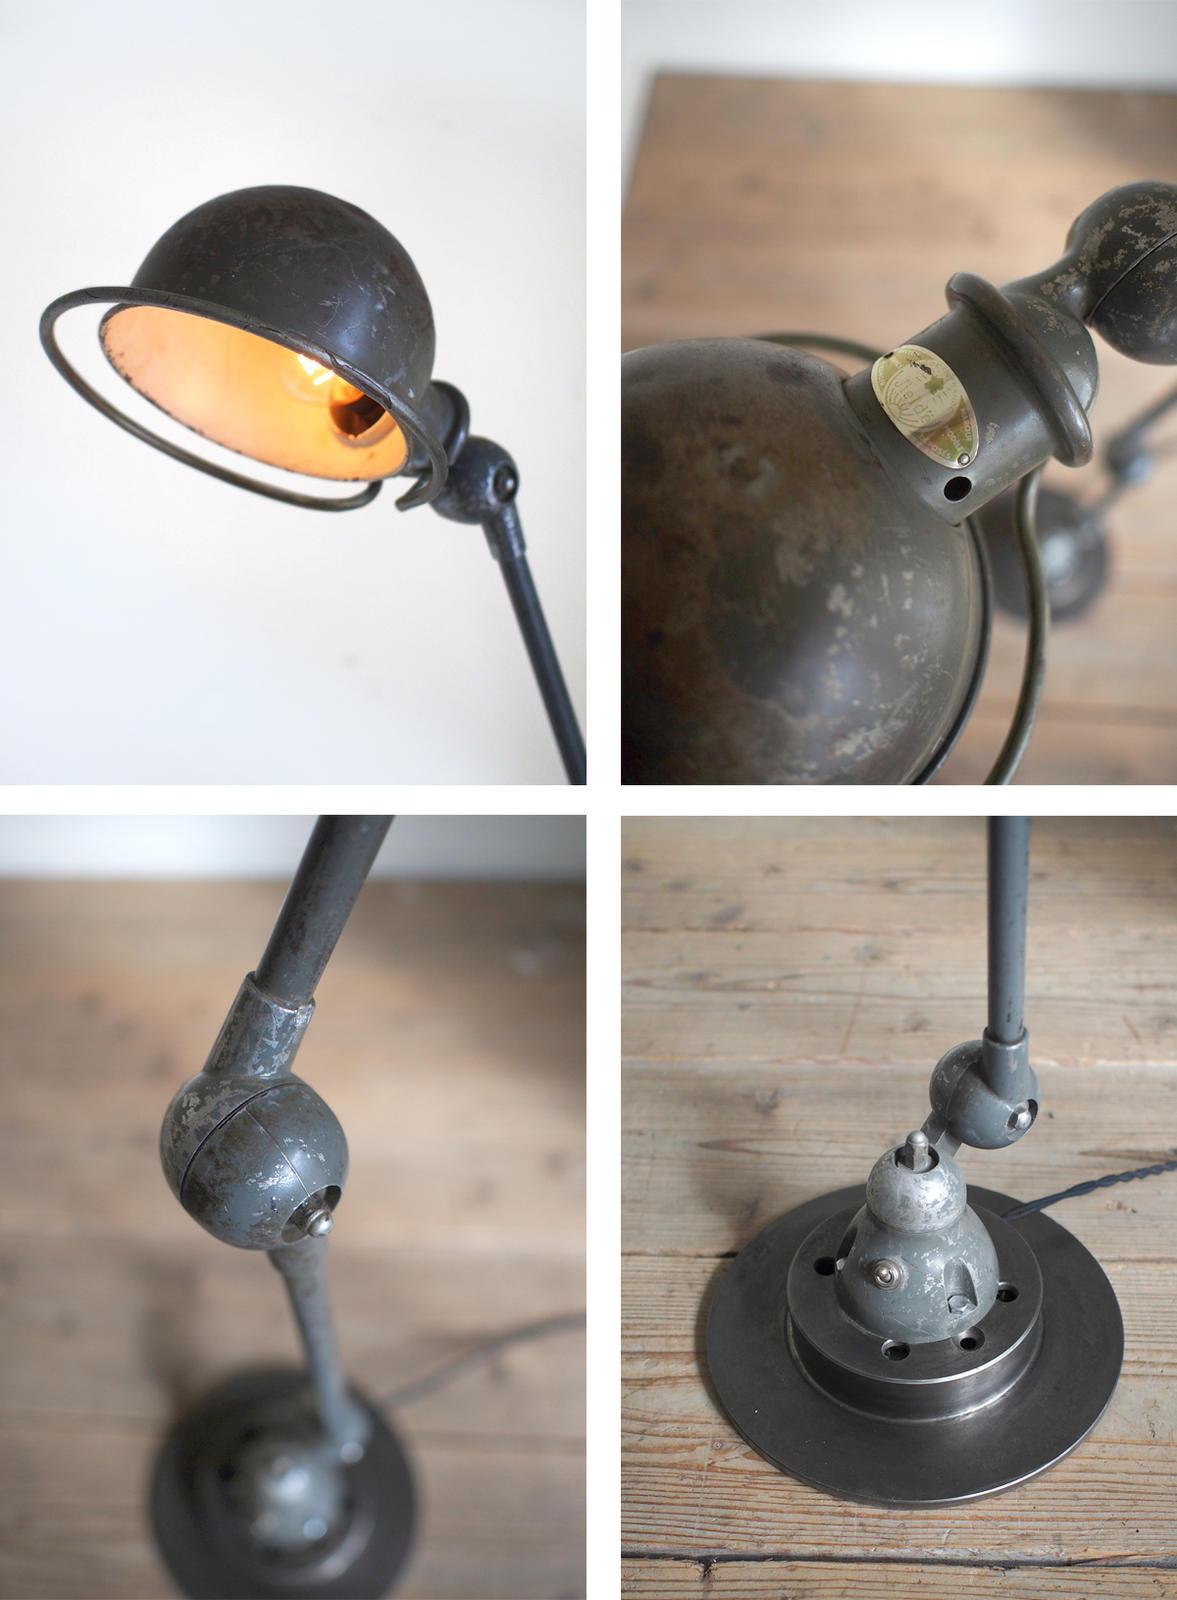 La Lampe Jielde Histoire D Une Lampe D Atelier Devenue Culte